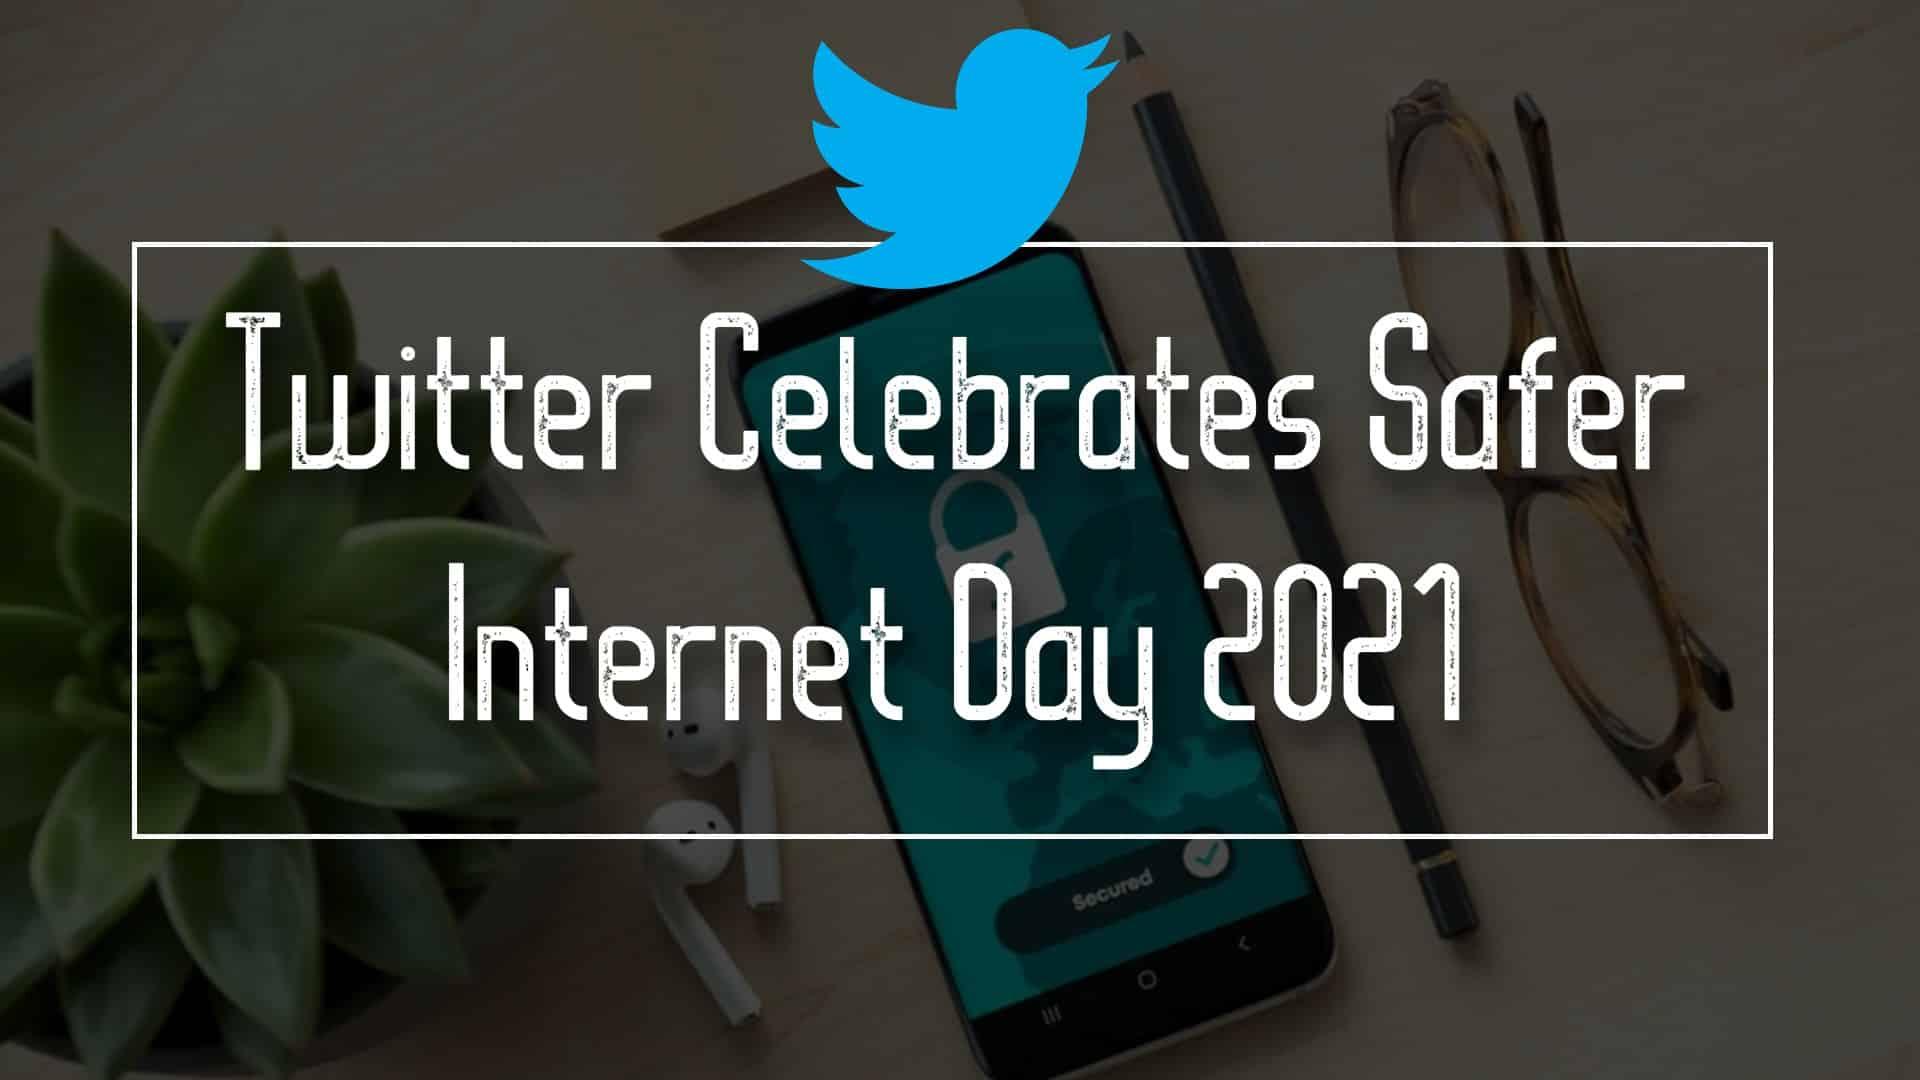 Twitter Celebrates Safer Internet Day 2021